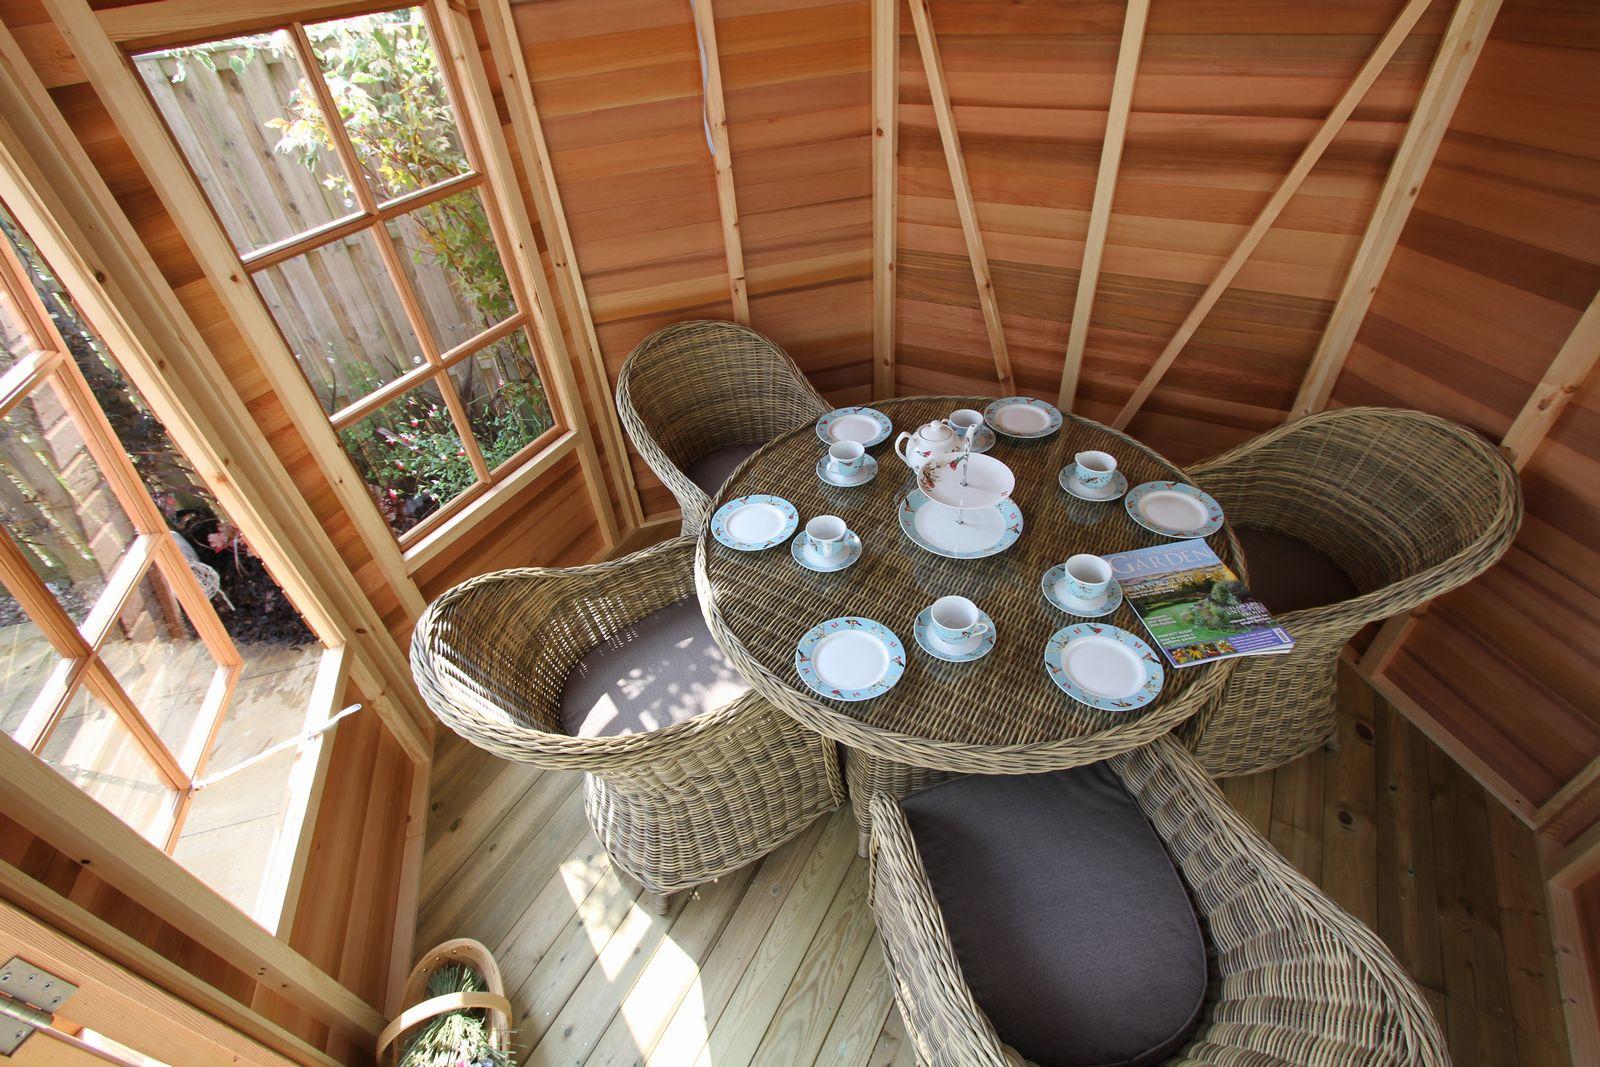 Stylish interior of an Alton Summerhouse!